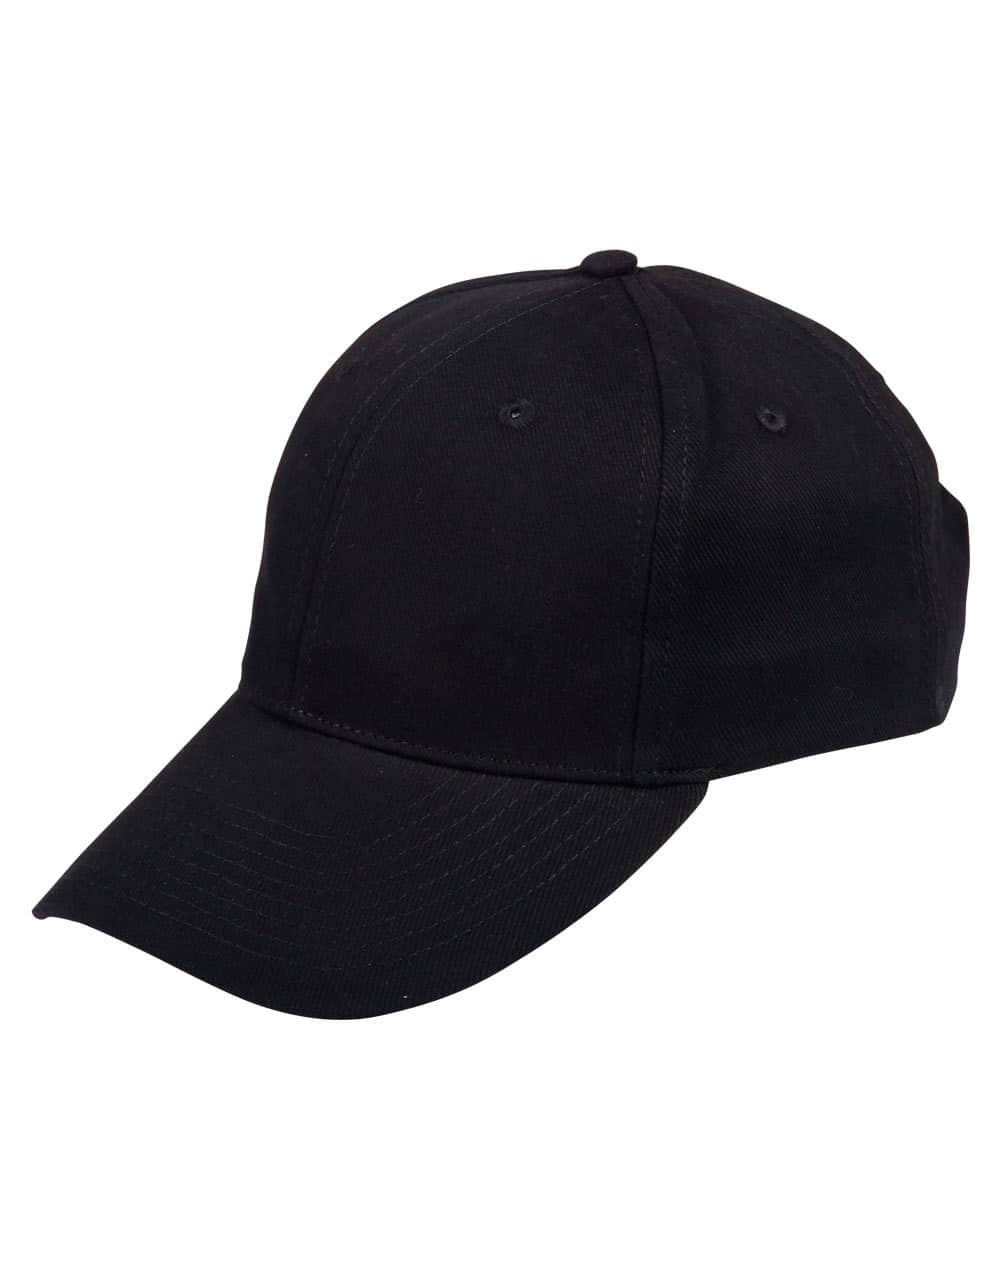 Black Heavy Brushed Cotton Cap